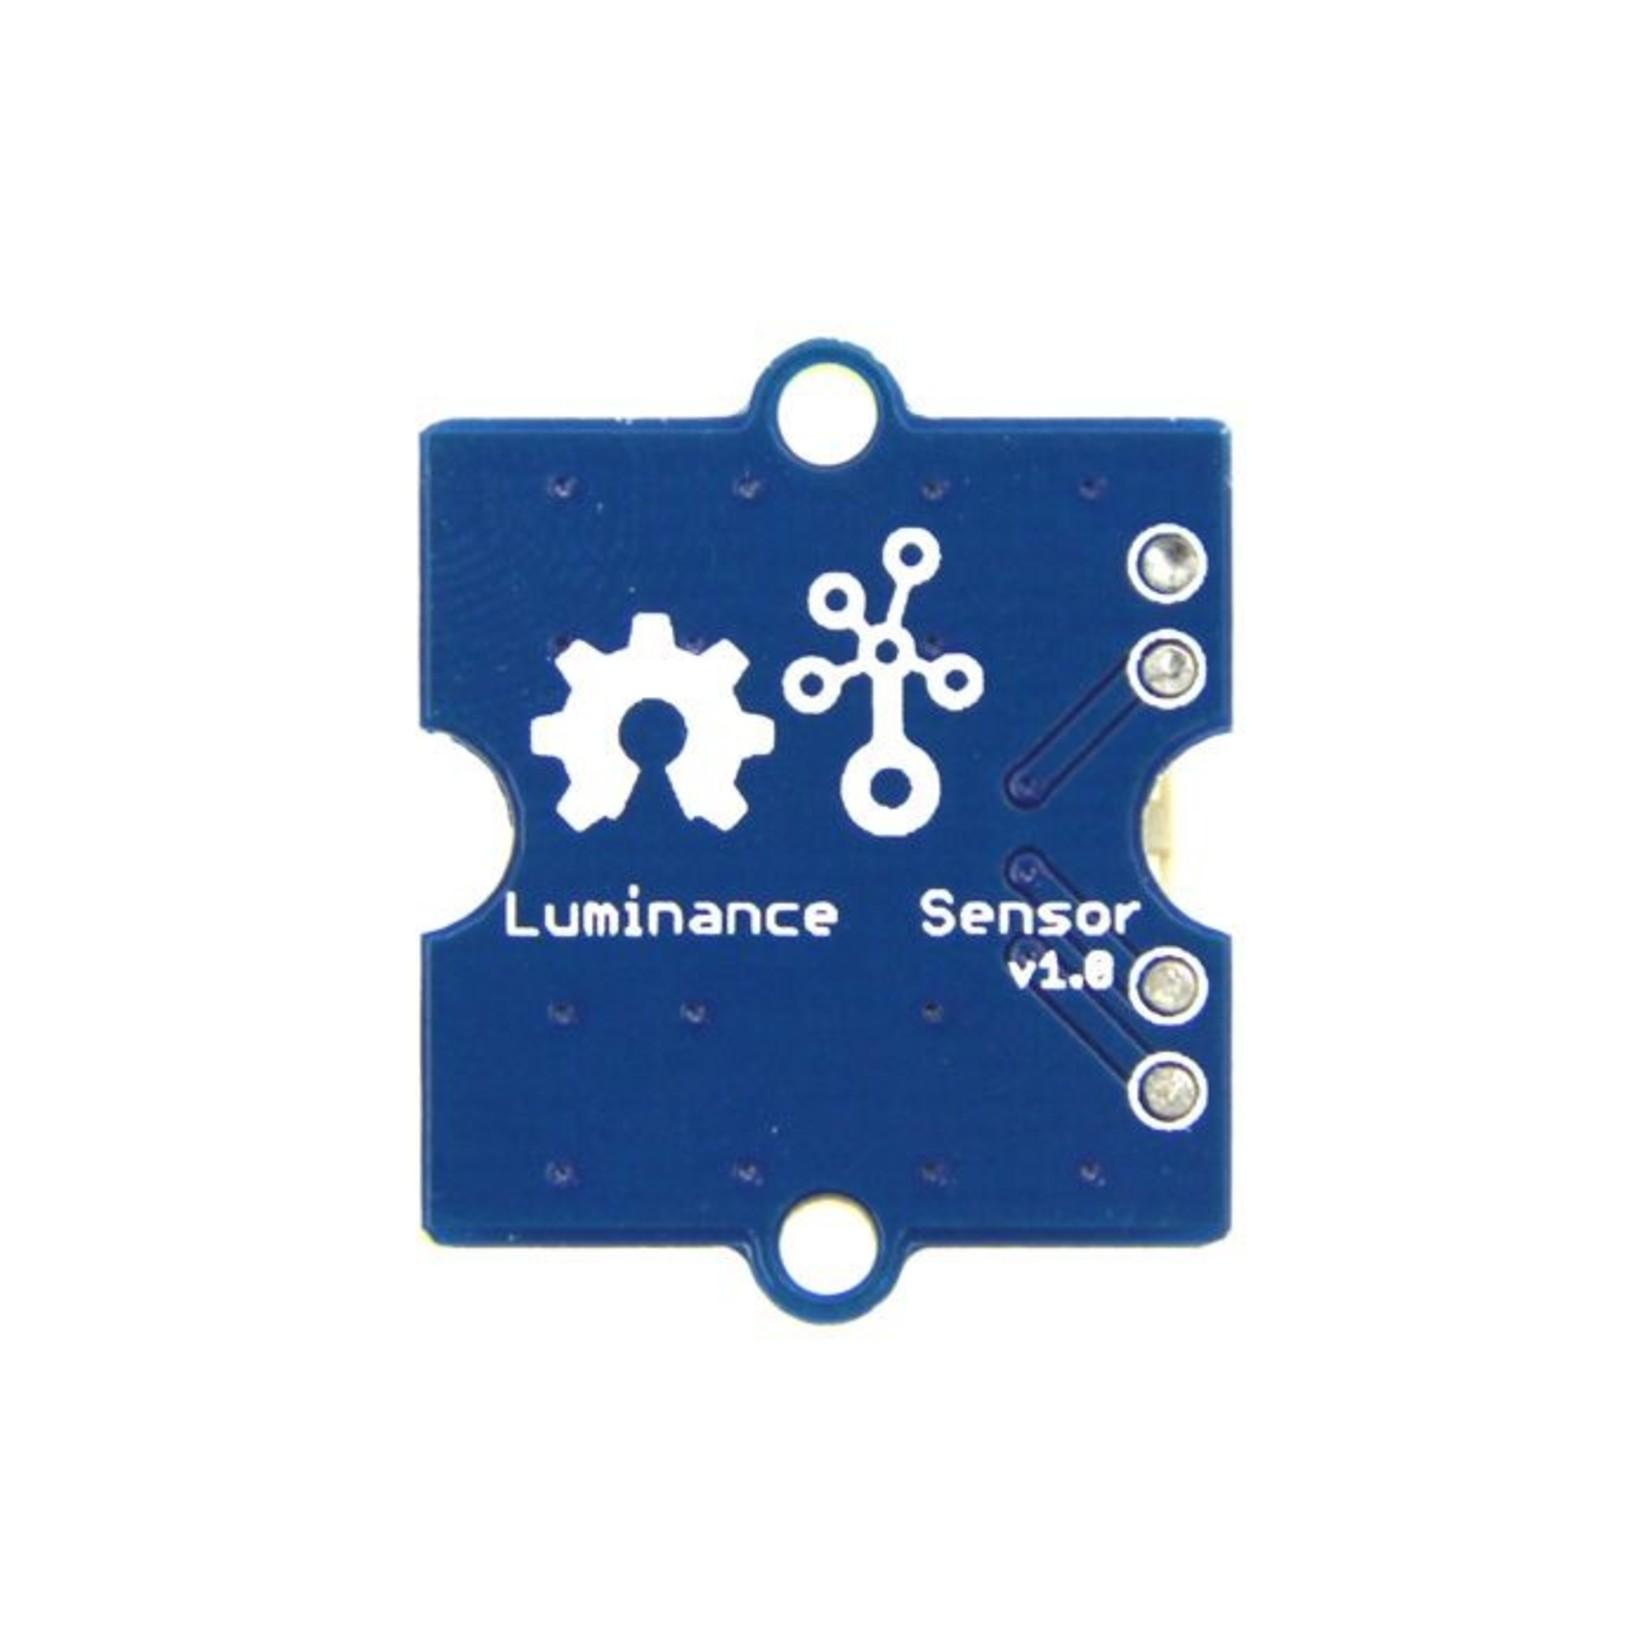 Seeed Grove - Luminance Sensor